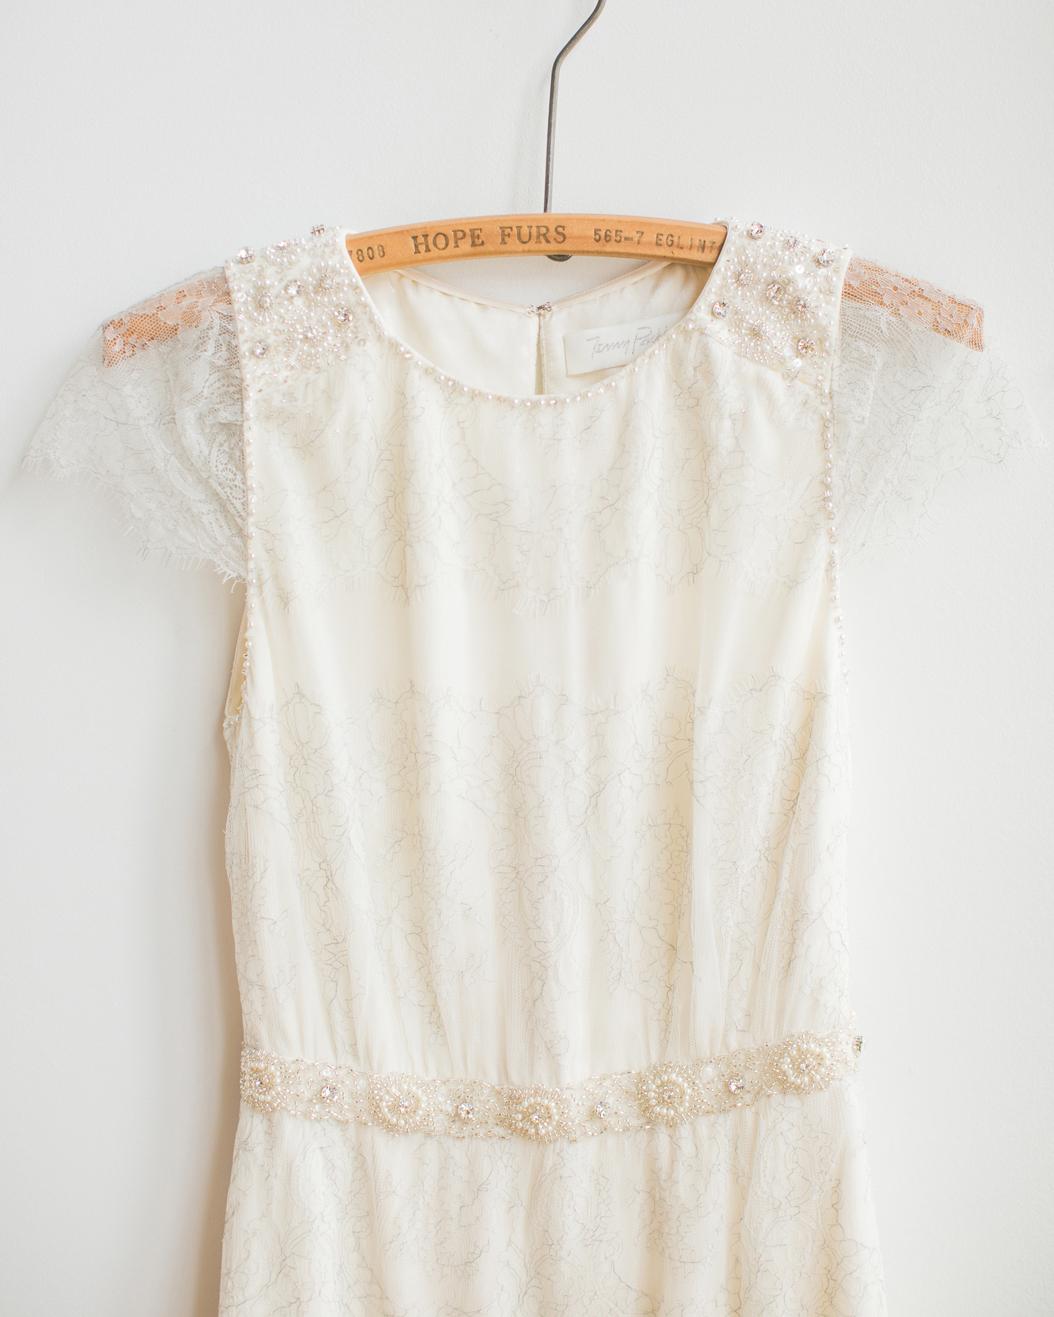 trish-alan-wedding-dress-014-s111348-0714.jpg